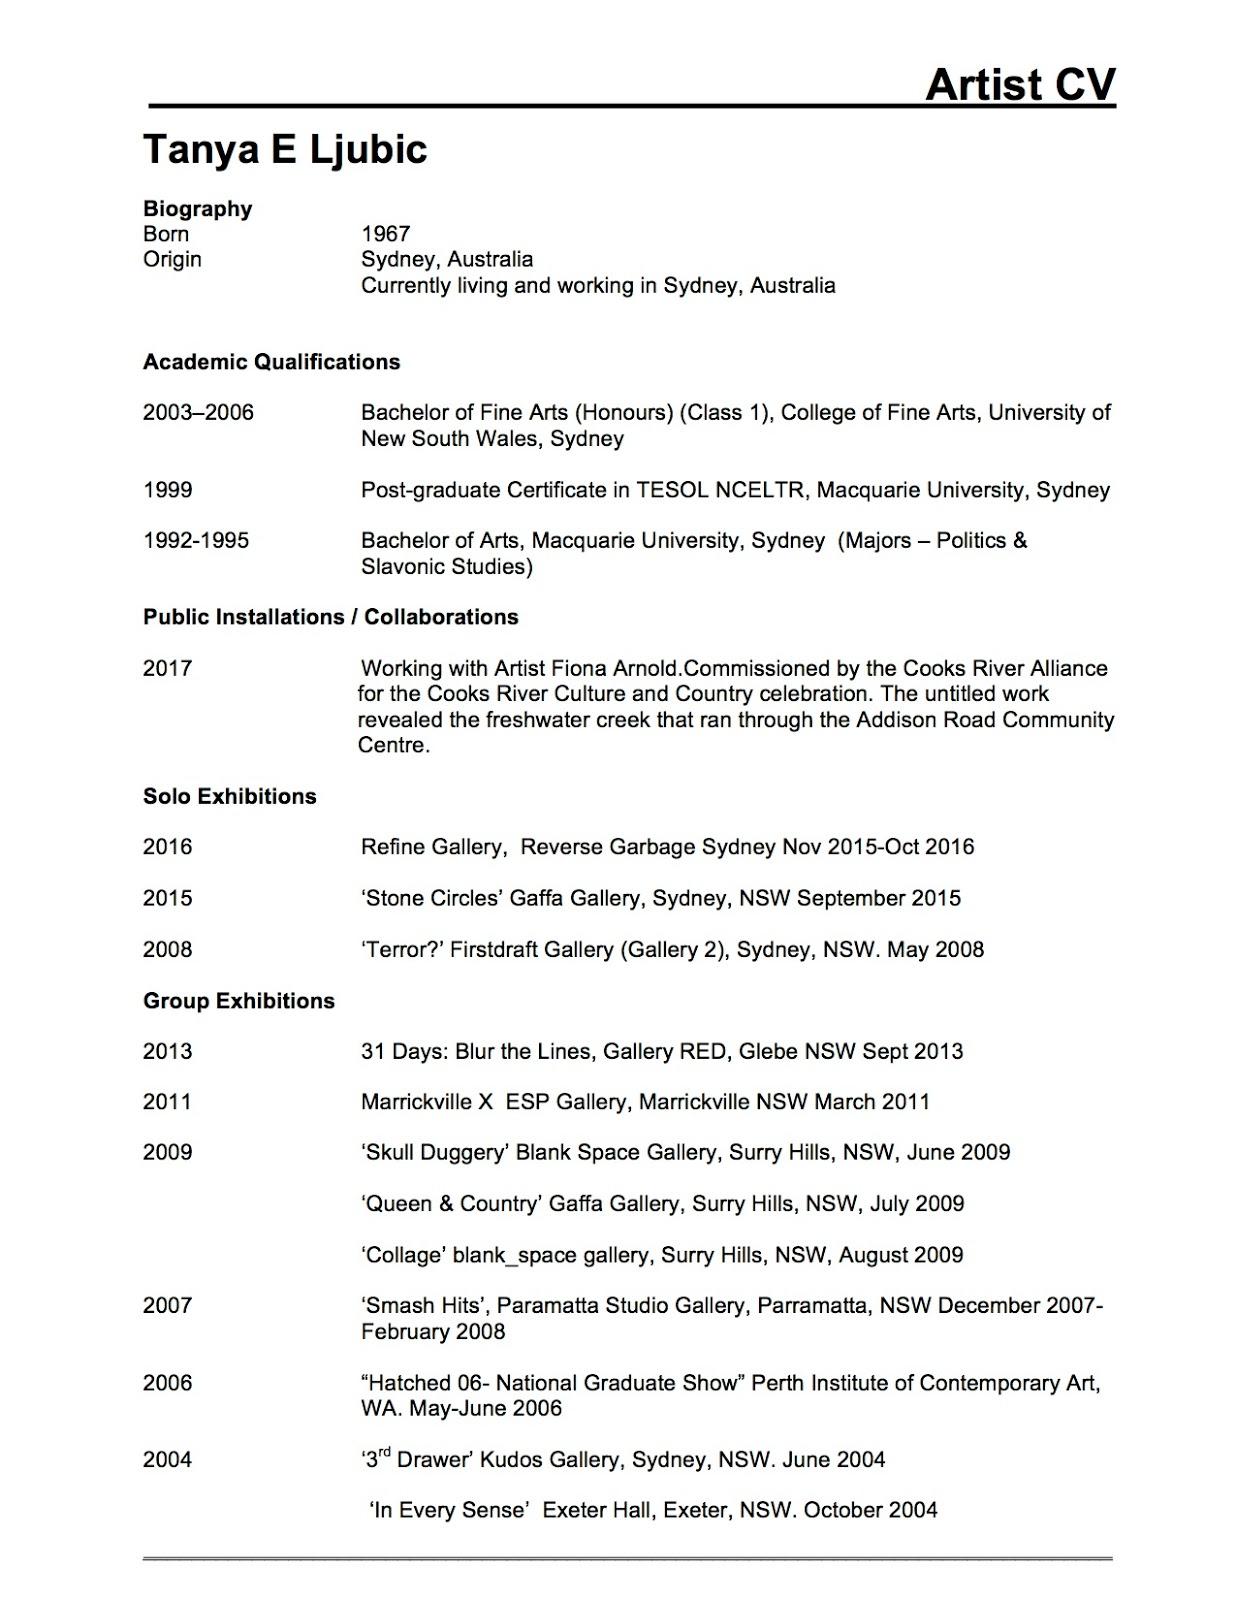 resume Resume And Selection Criteria Writers amazing resume and selection criteria writers sydney contemporary nice photos entry